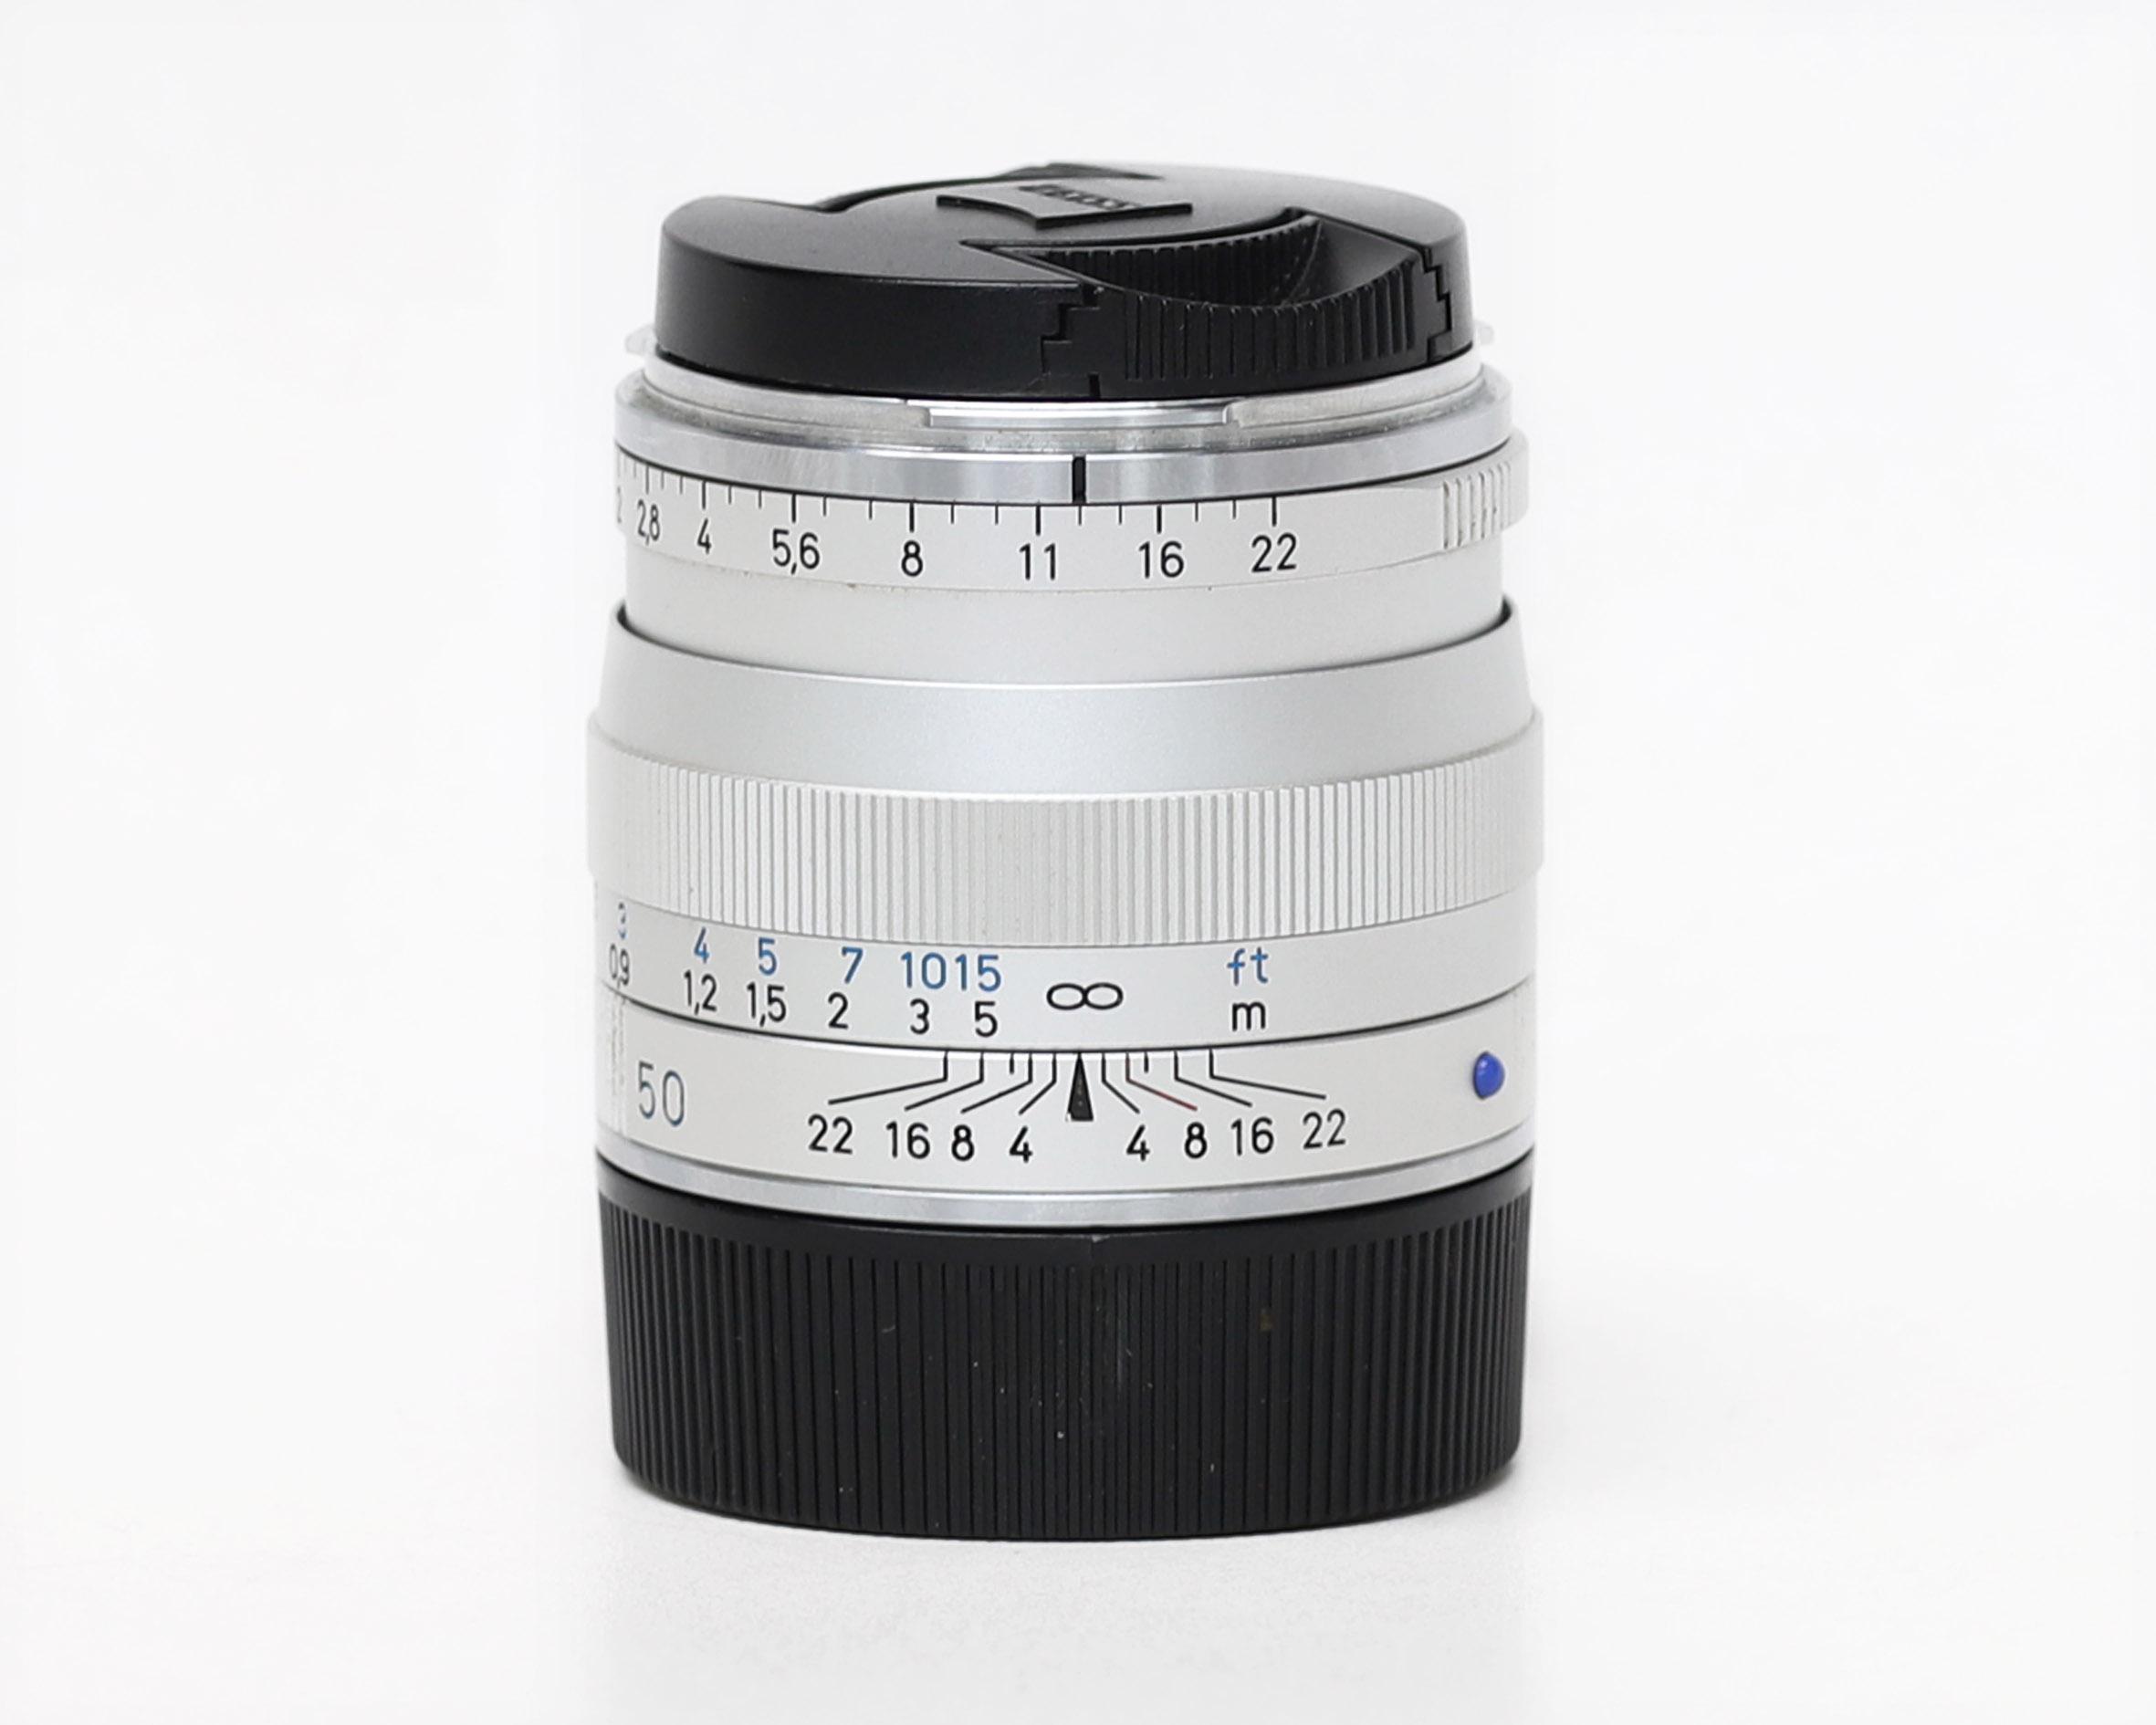 Carl Zeiss Planar T* 50mm f/2 ZM Lens (Silver)